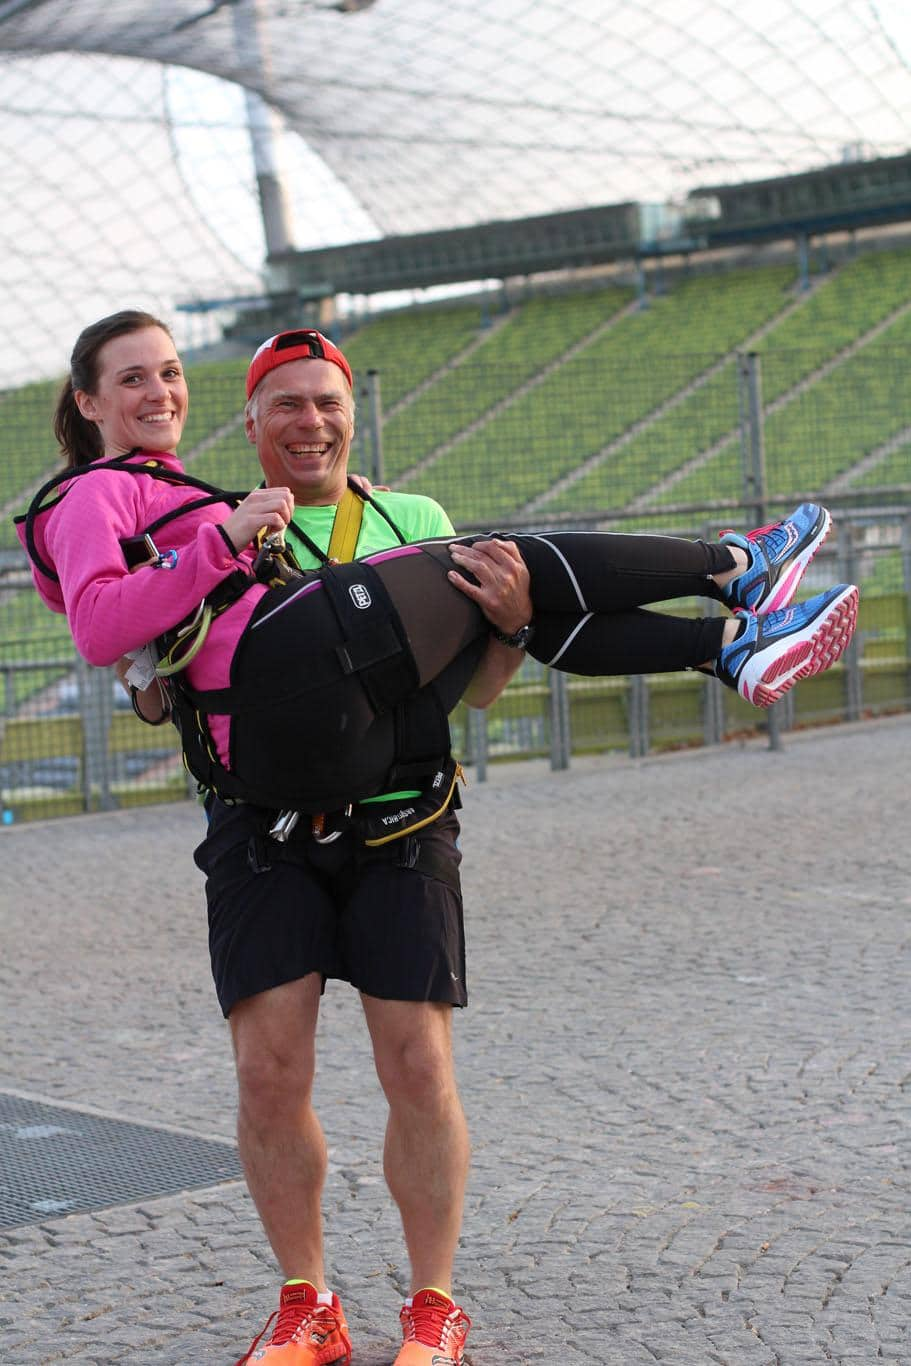 Theresa wird auf Armen getragen Bild: i-like-shoes.de